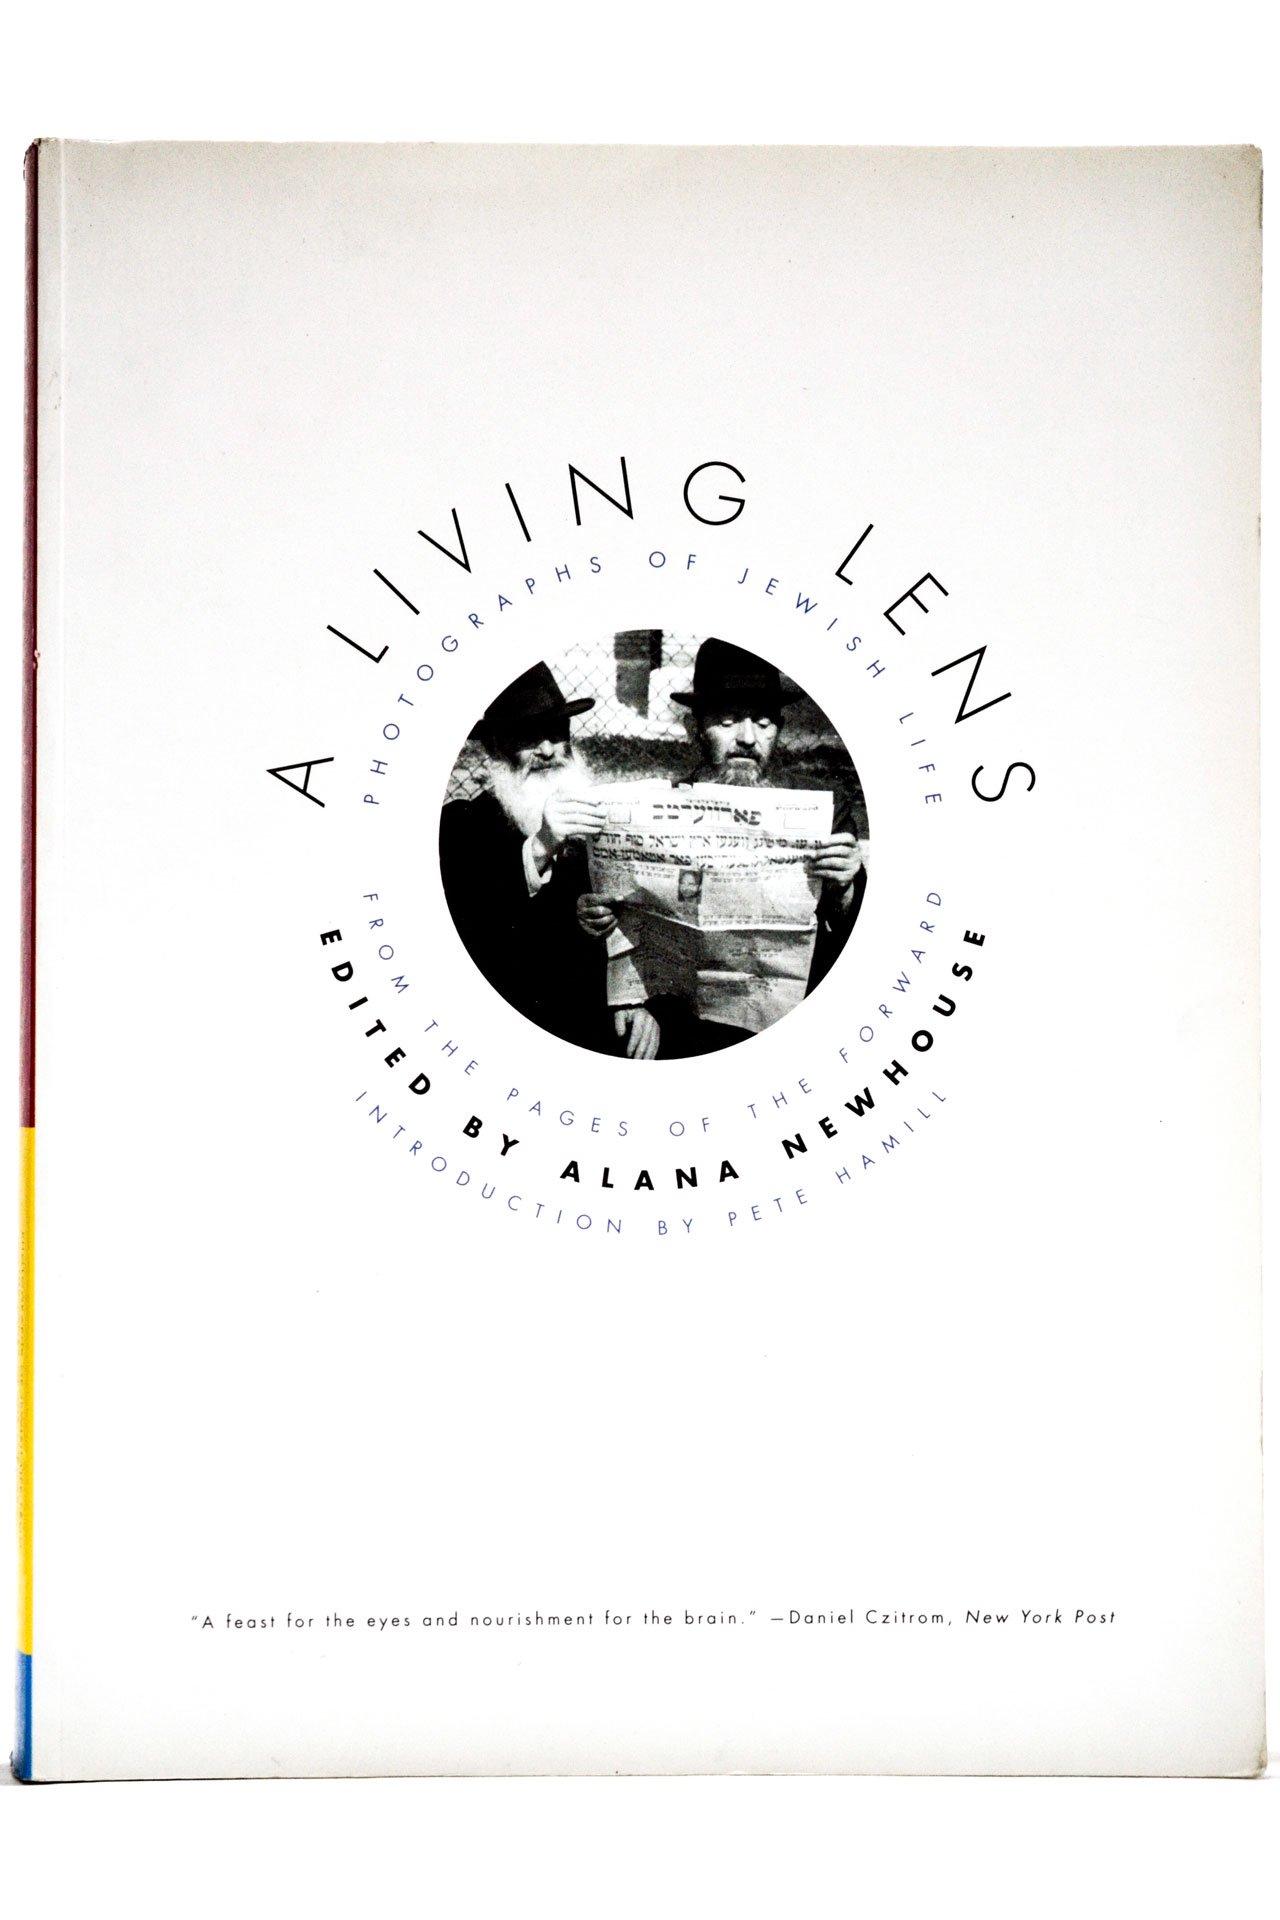 Decorative Book - A Living Lens